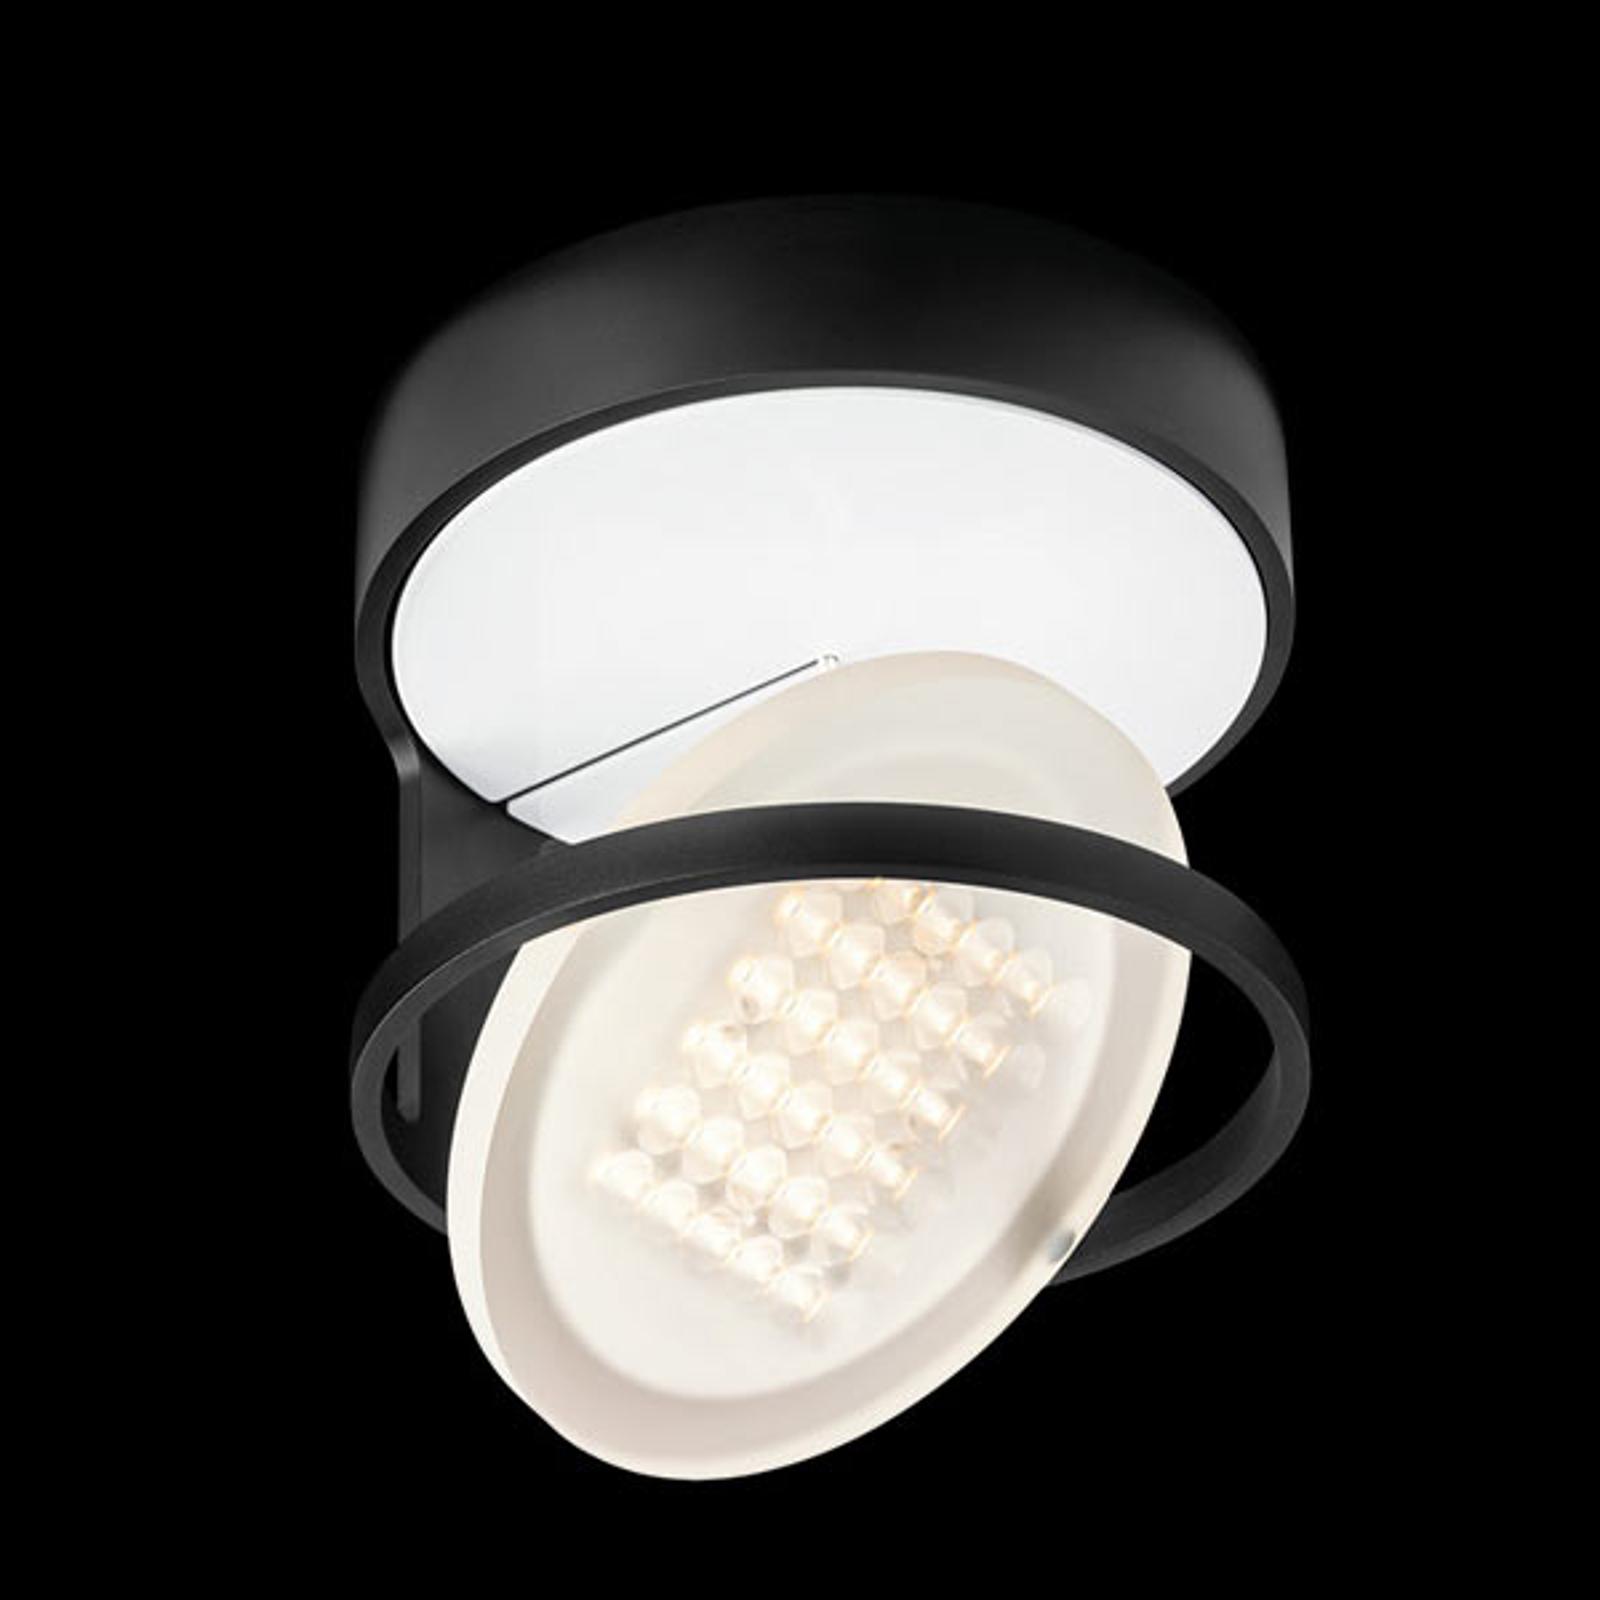 Nimbus Rim R 36 LED-kattovalaisin, grafiitti